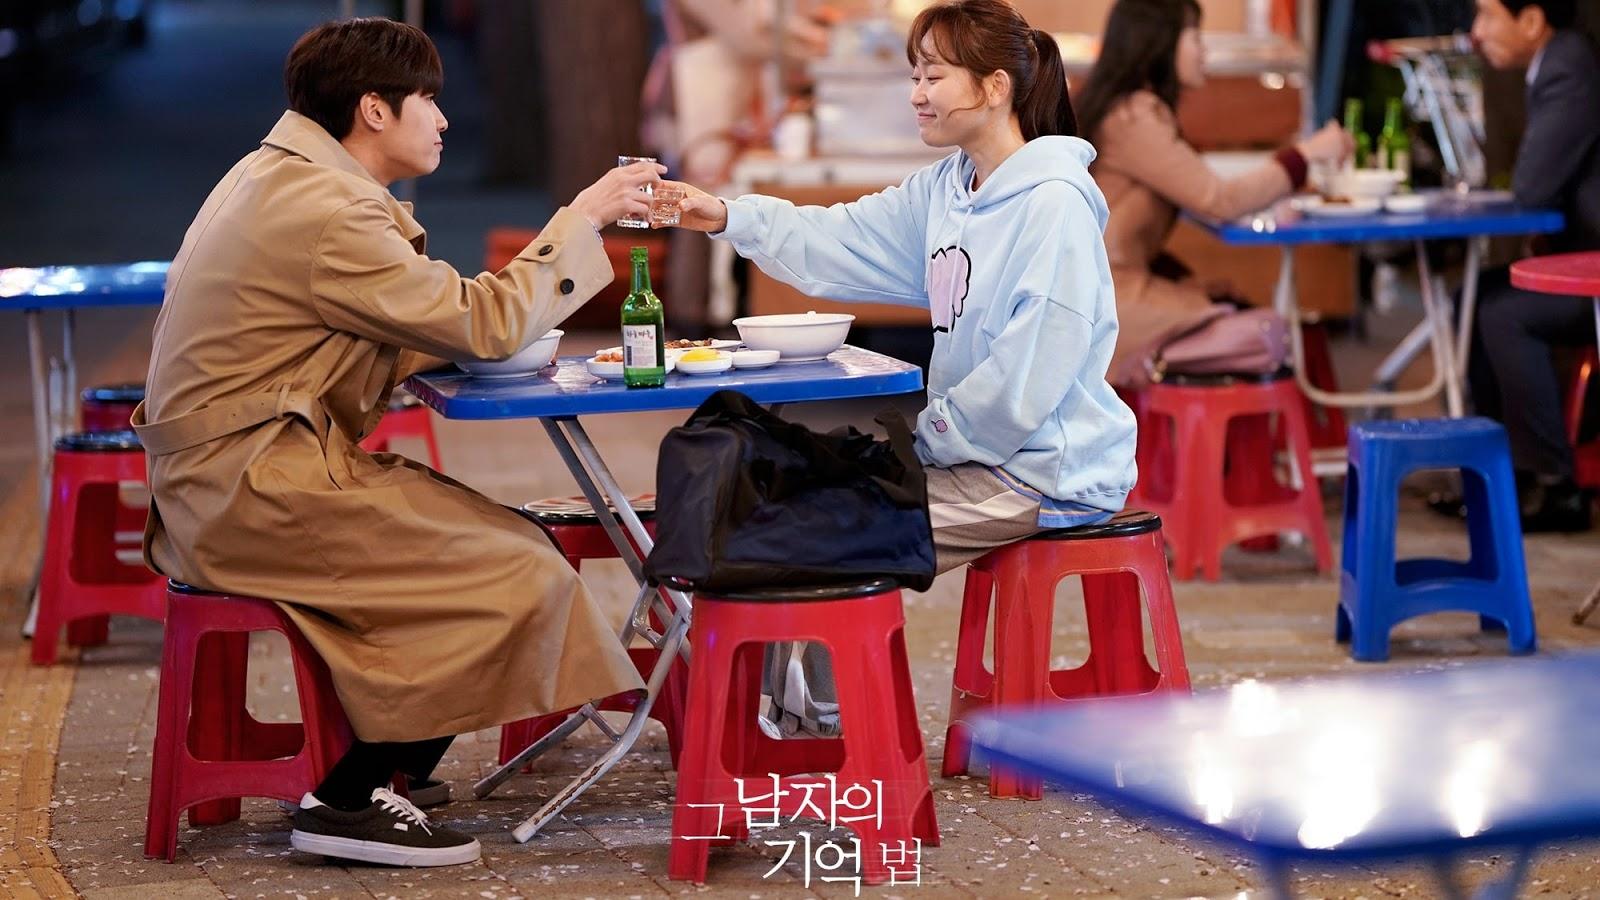 Kim Seul Gi Criticized by Fans for Calling Lee Jin Hyuk 'Honey'